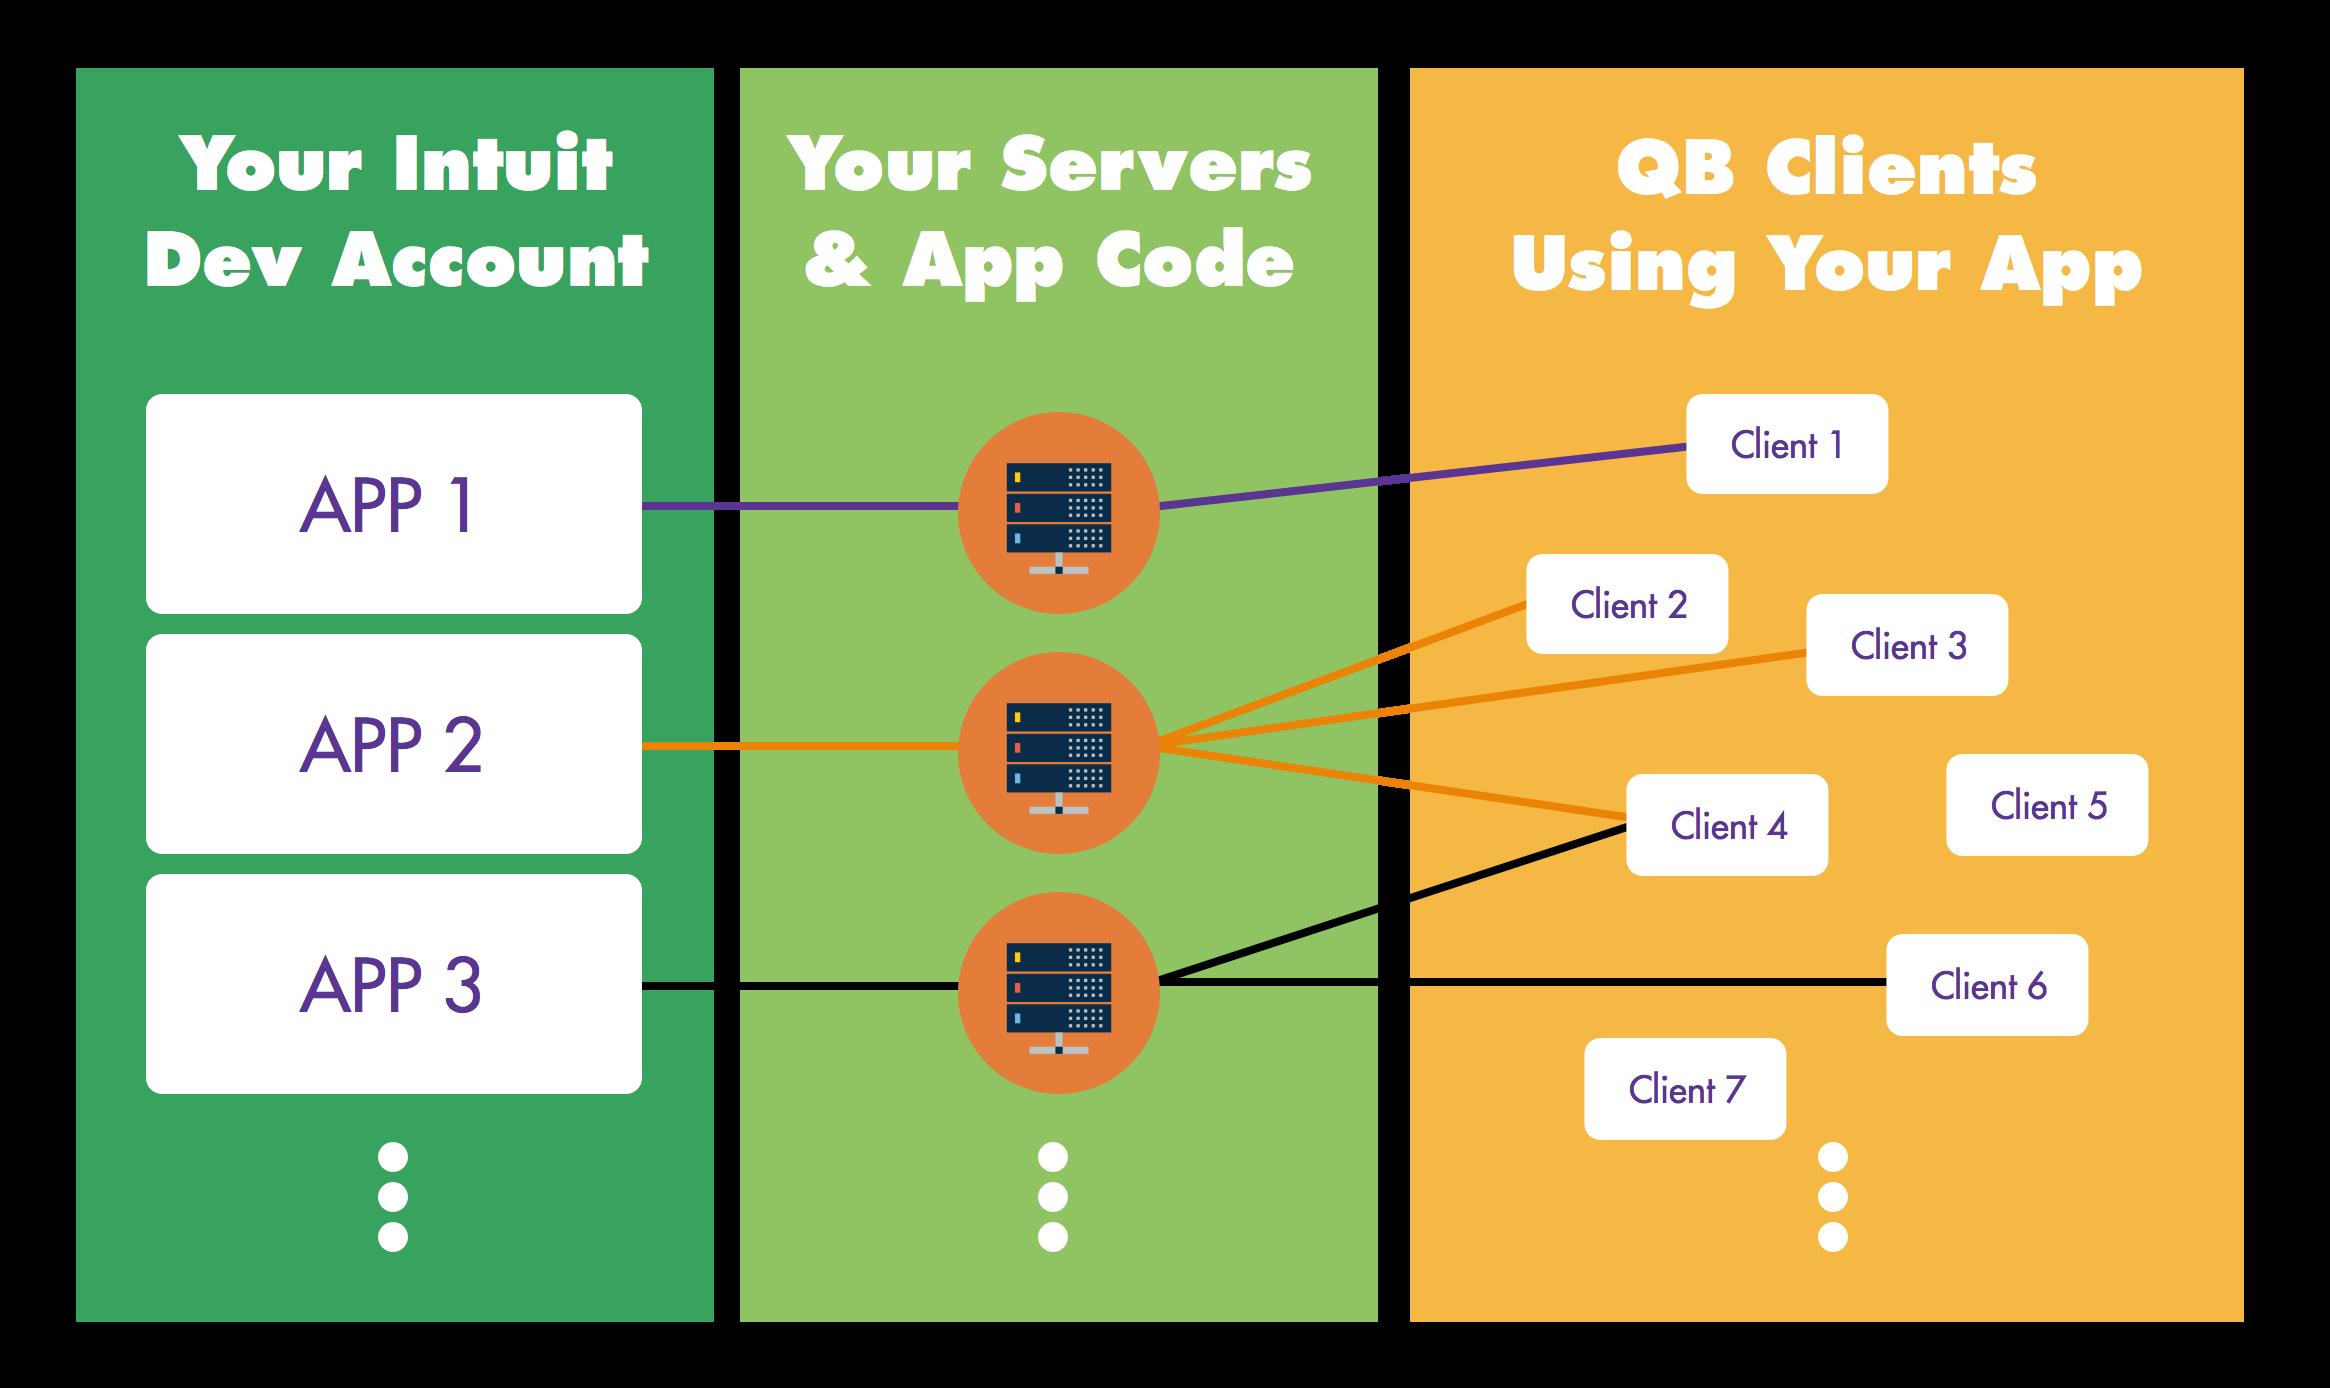 NuRelm - QuickBooks API Integration 1: The Basics